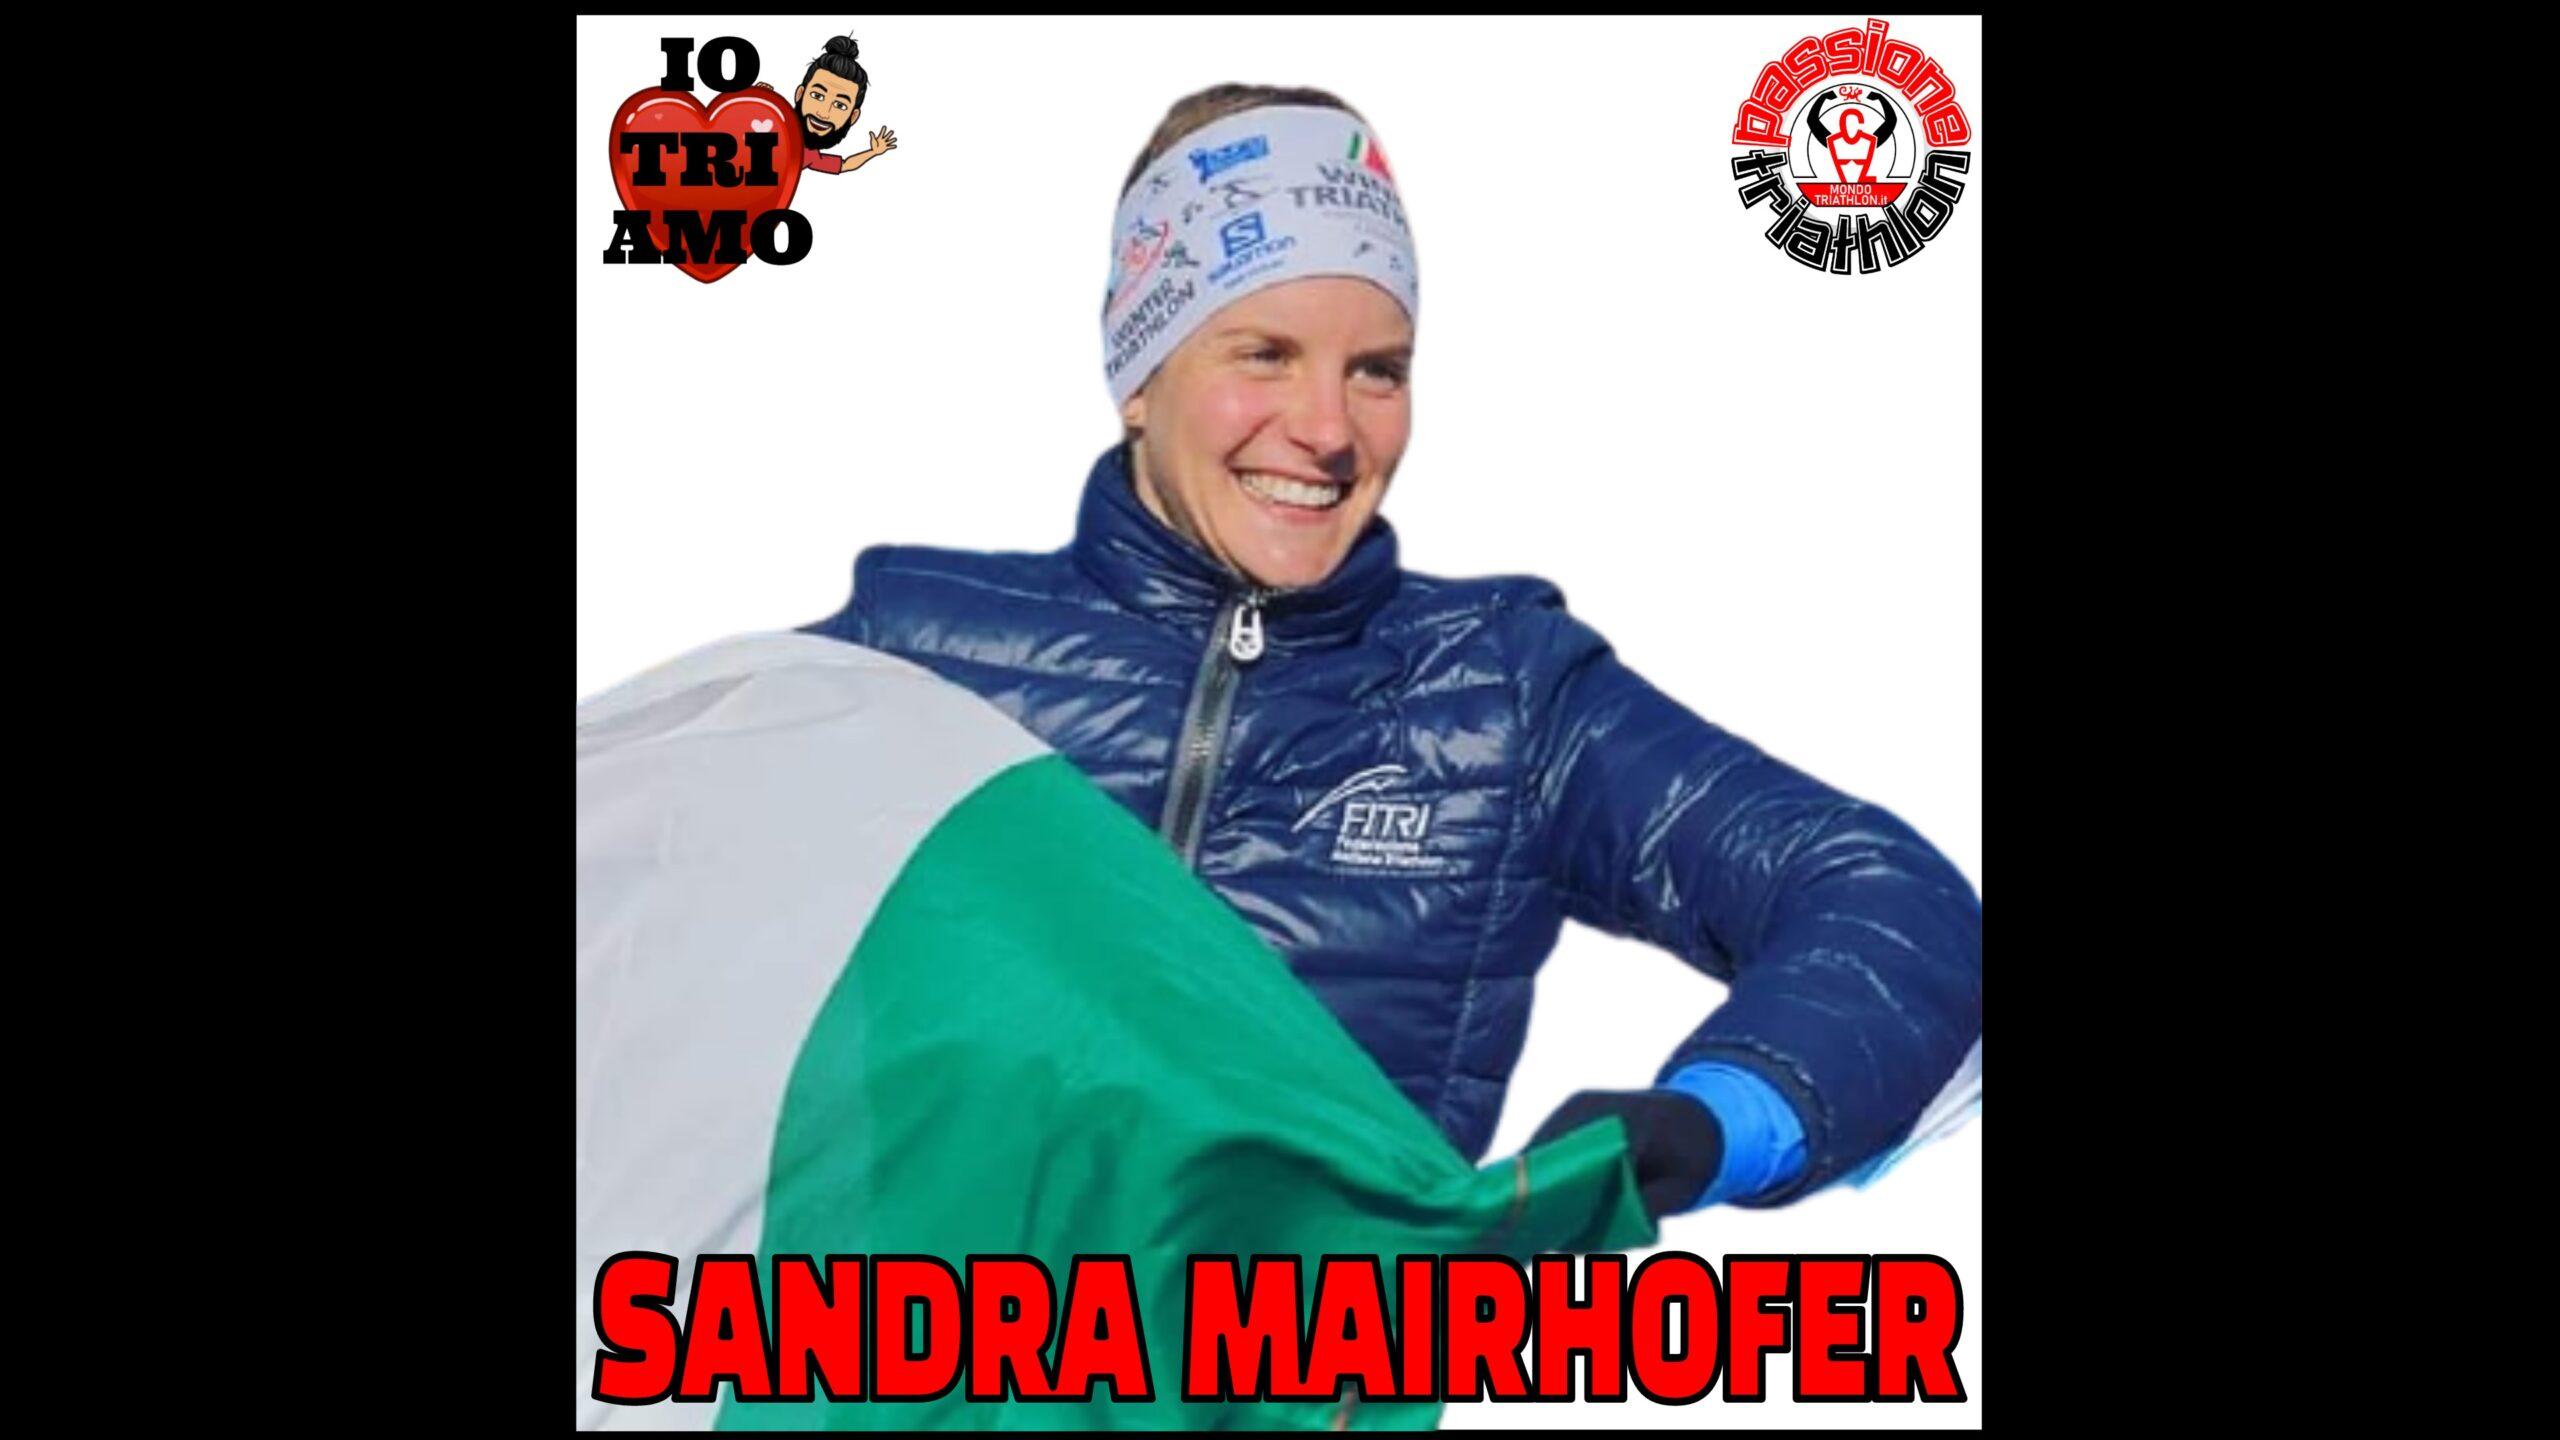 Sandra Mairhofer Passione Triathlon n° 91